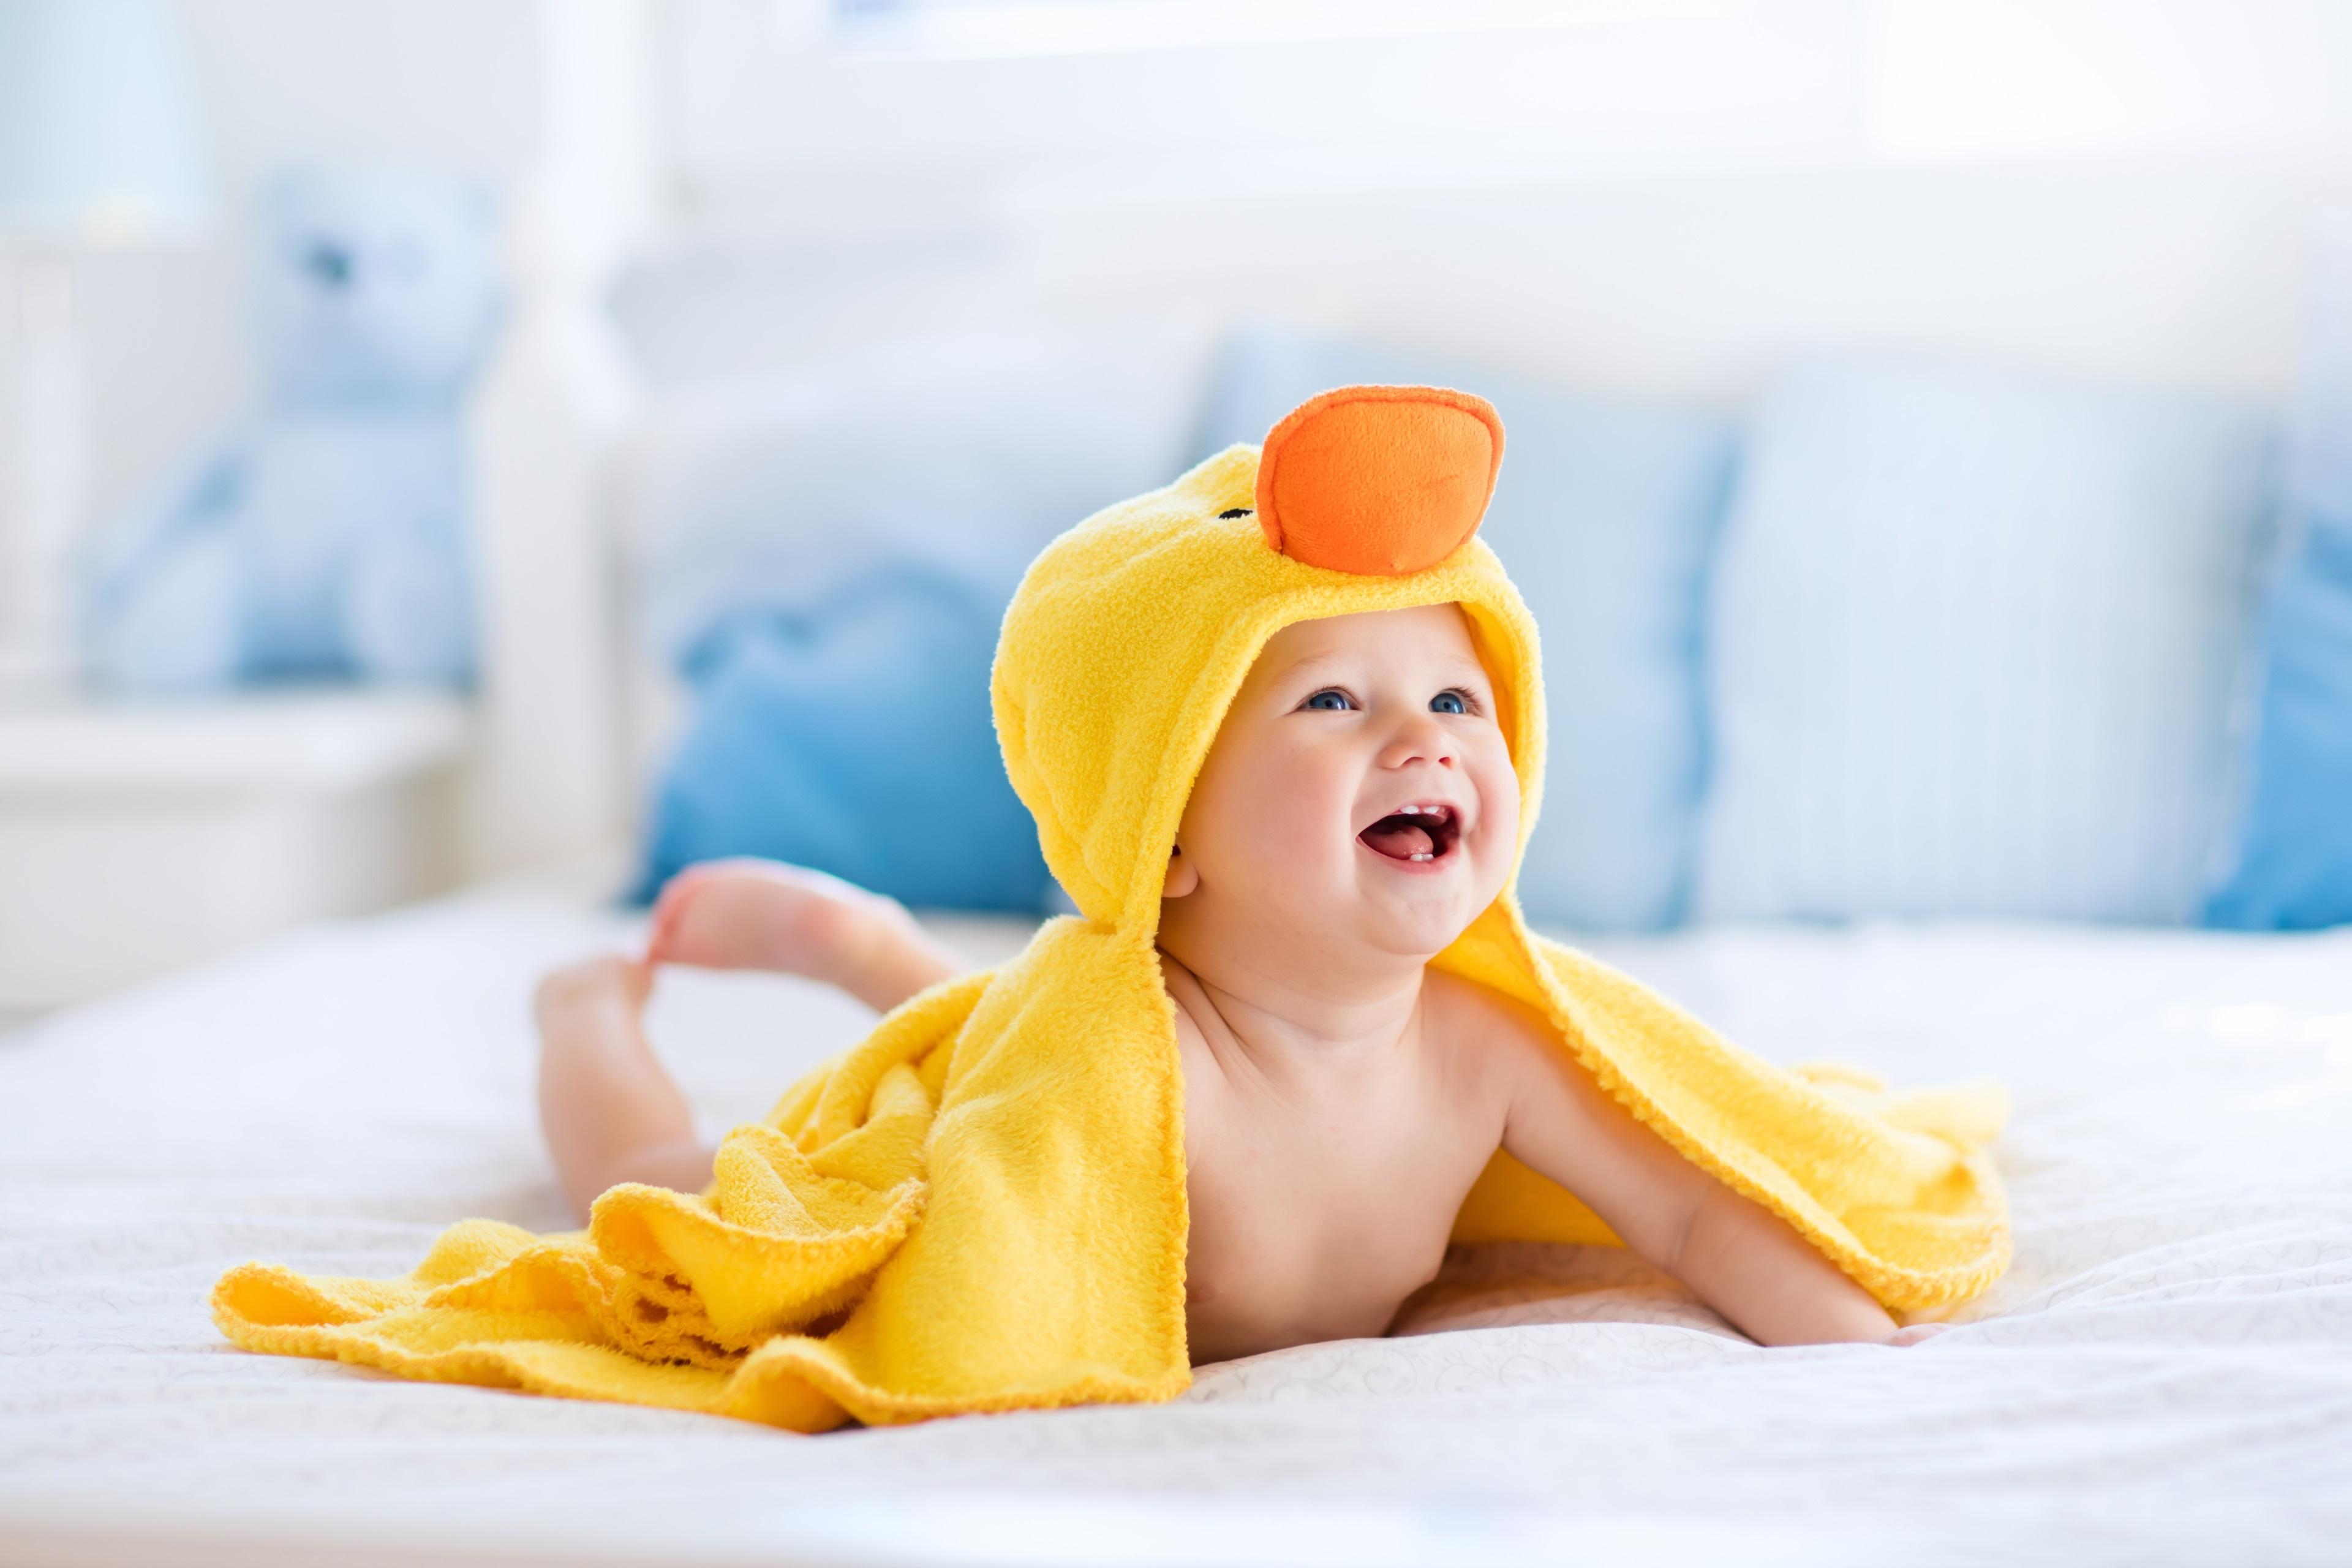 Cute Baby Photo 4k   3840x2560 Wallpaper   teahubio 3840x2560